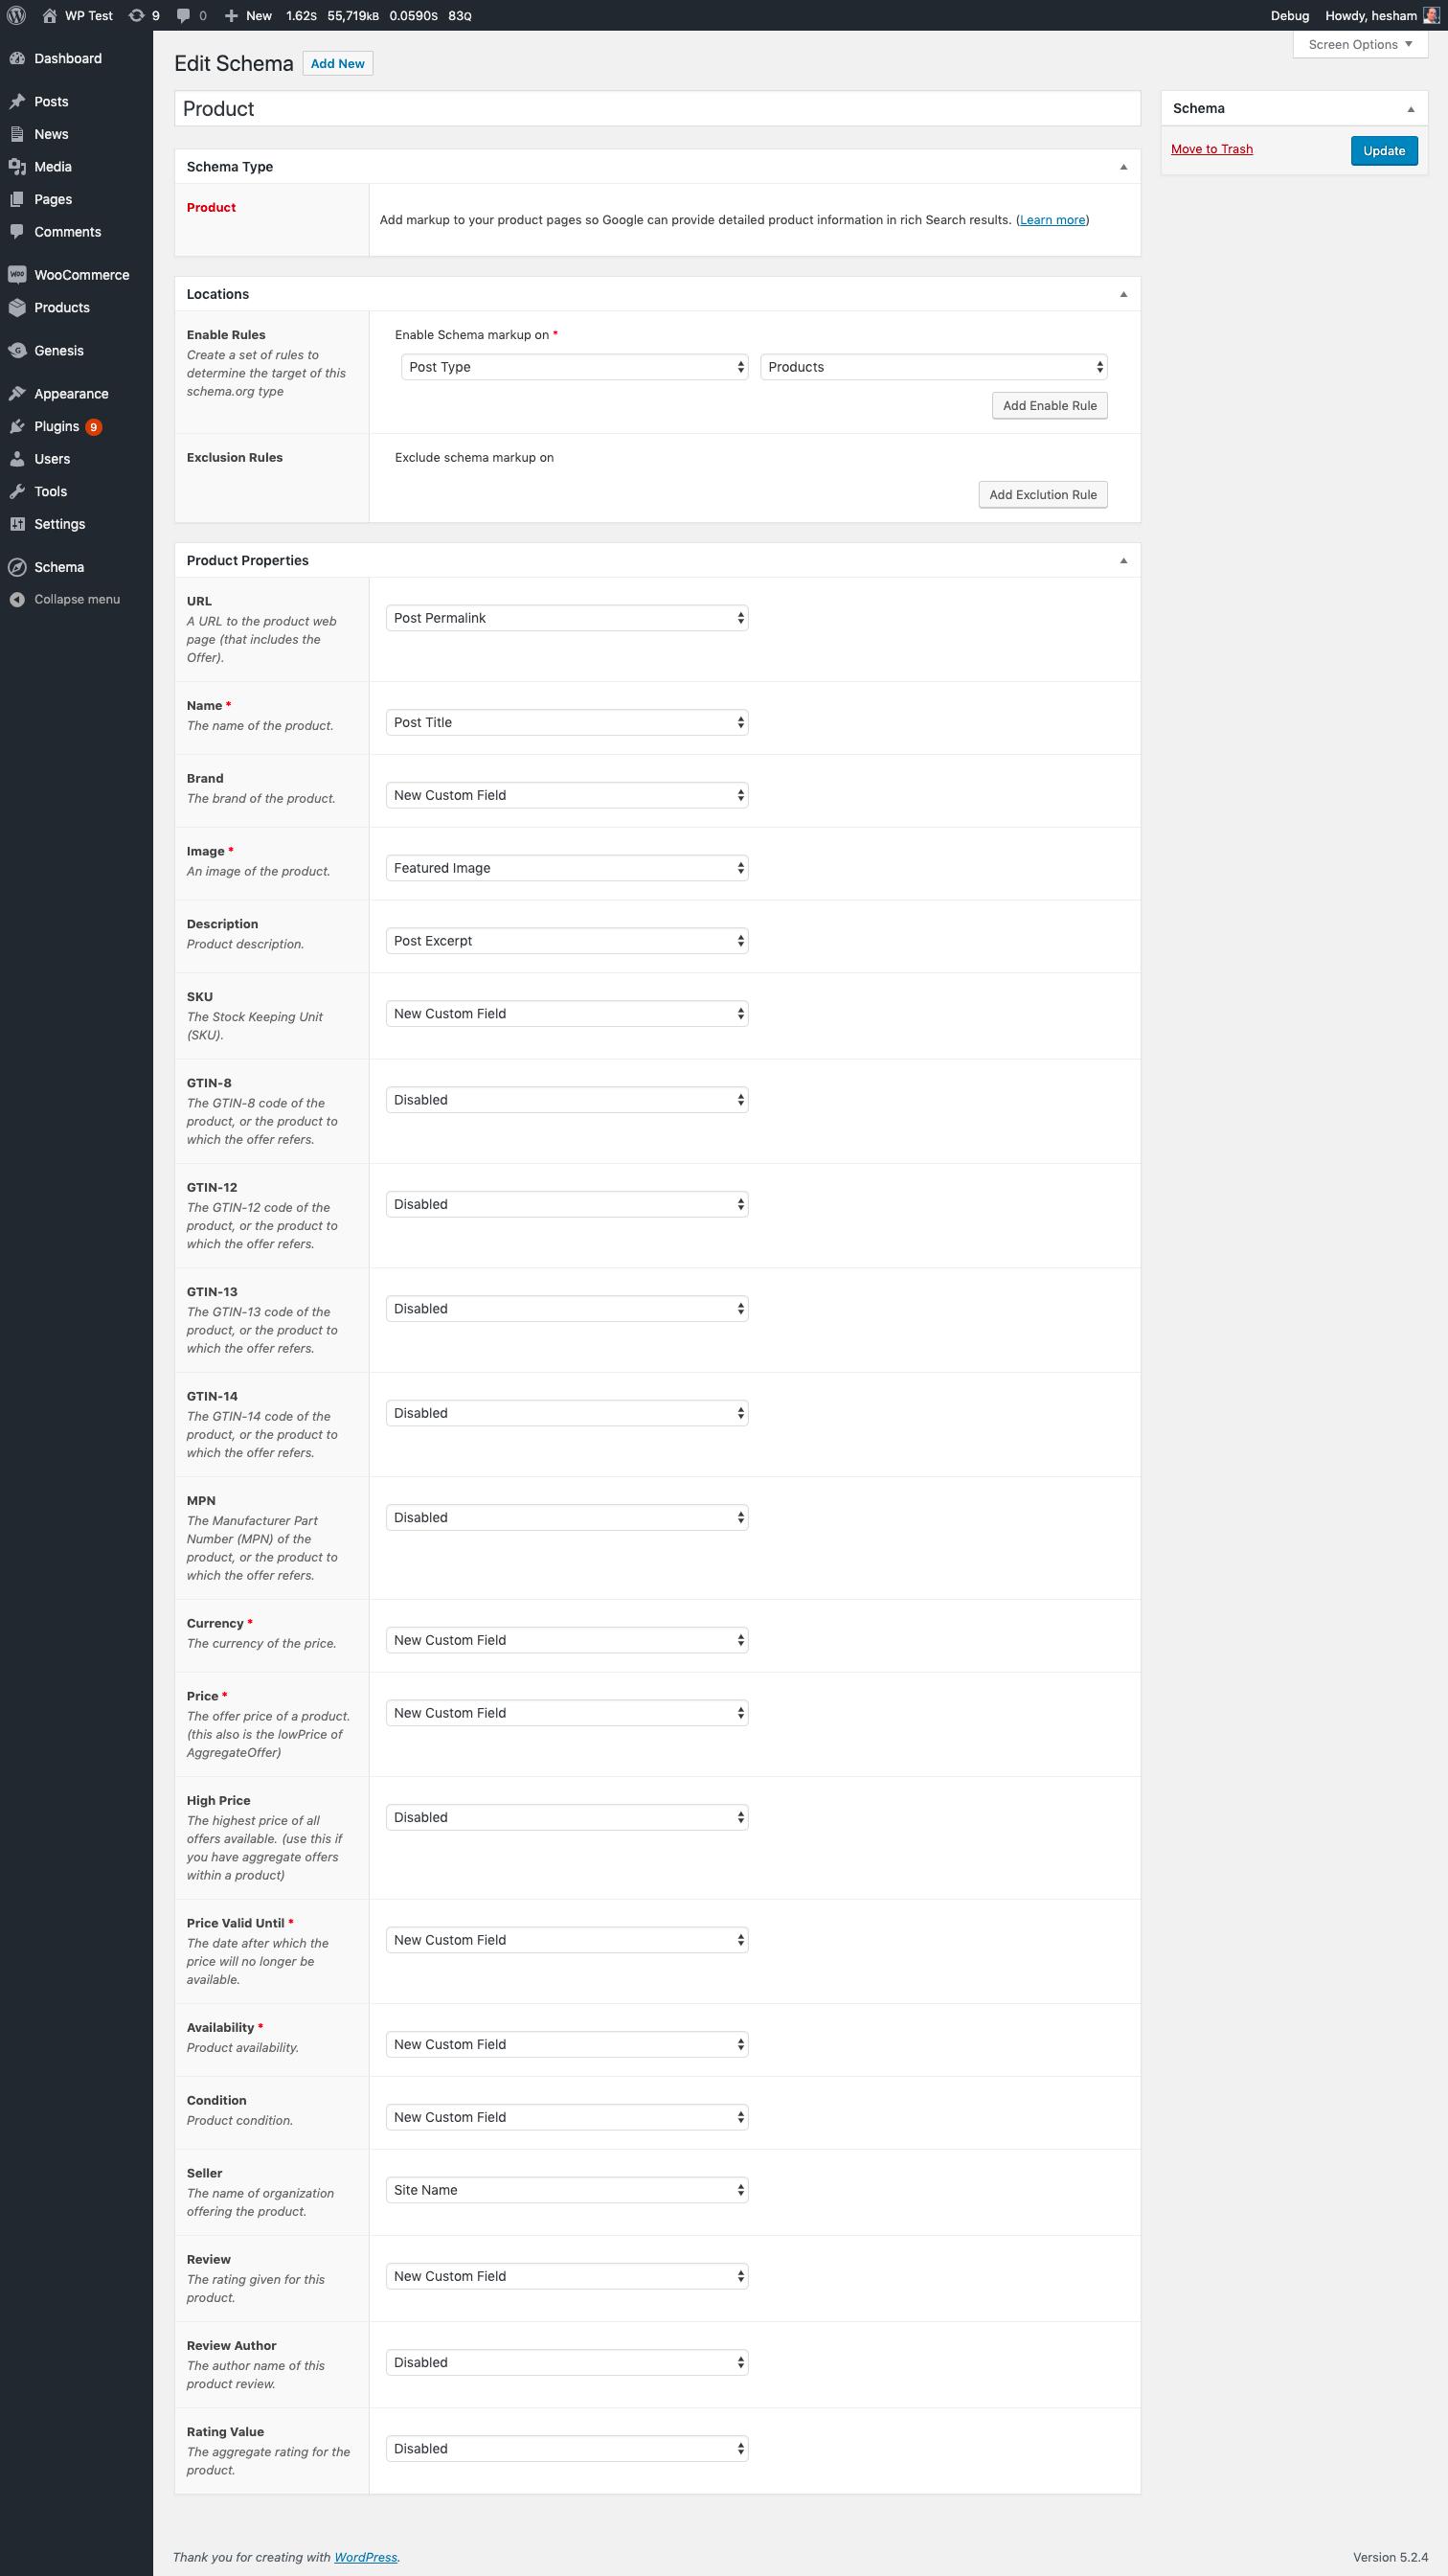 Schema Premium Product add properties settings screen